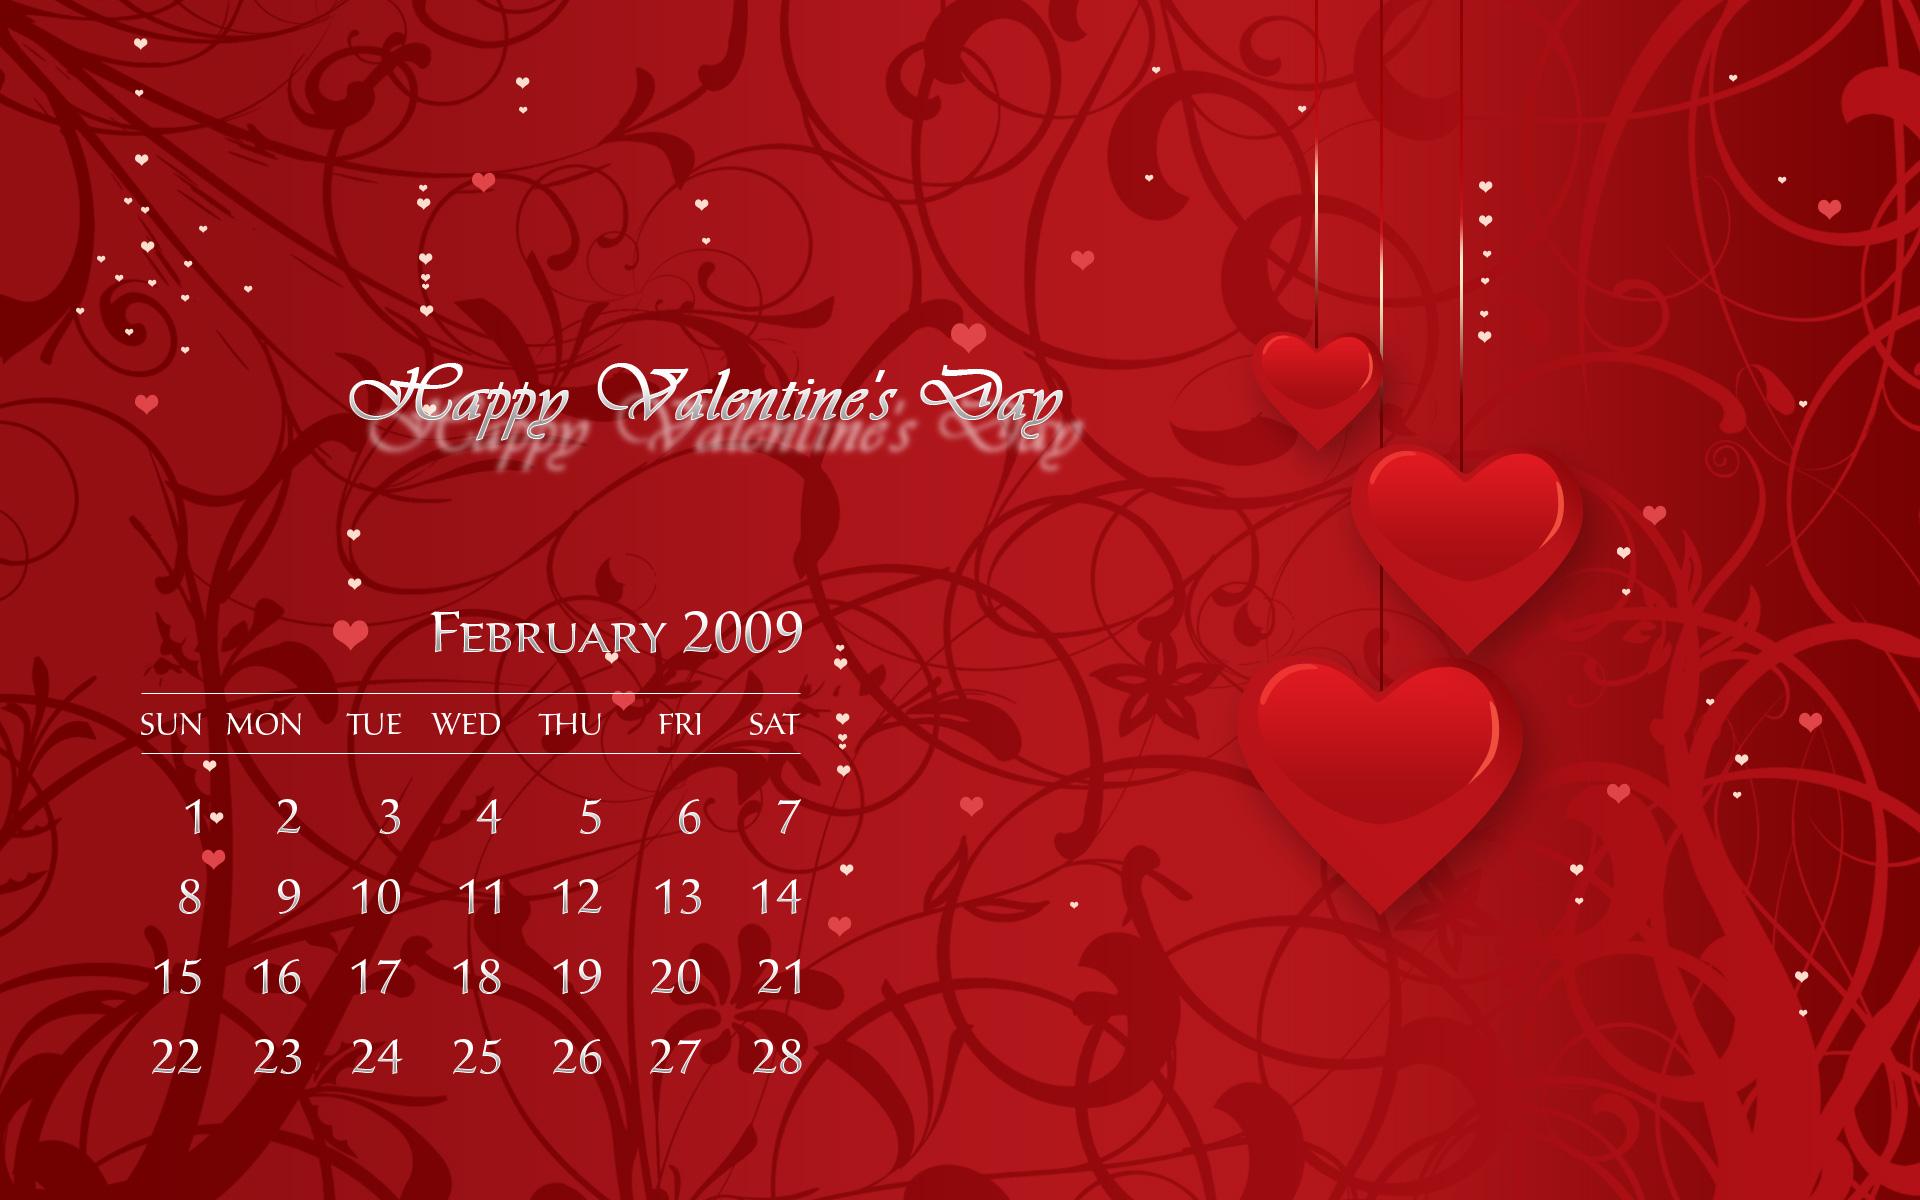 Romantic February 2009 Calendar Wallpaper Photoshop Tutorials 1920x1200